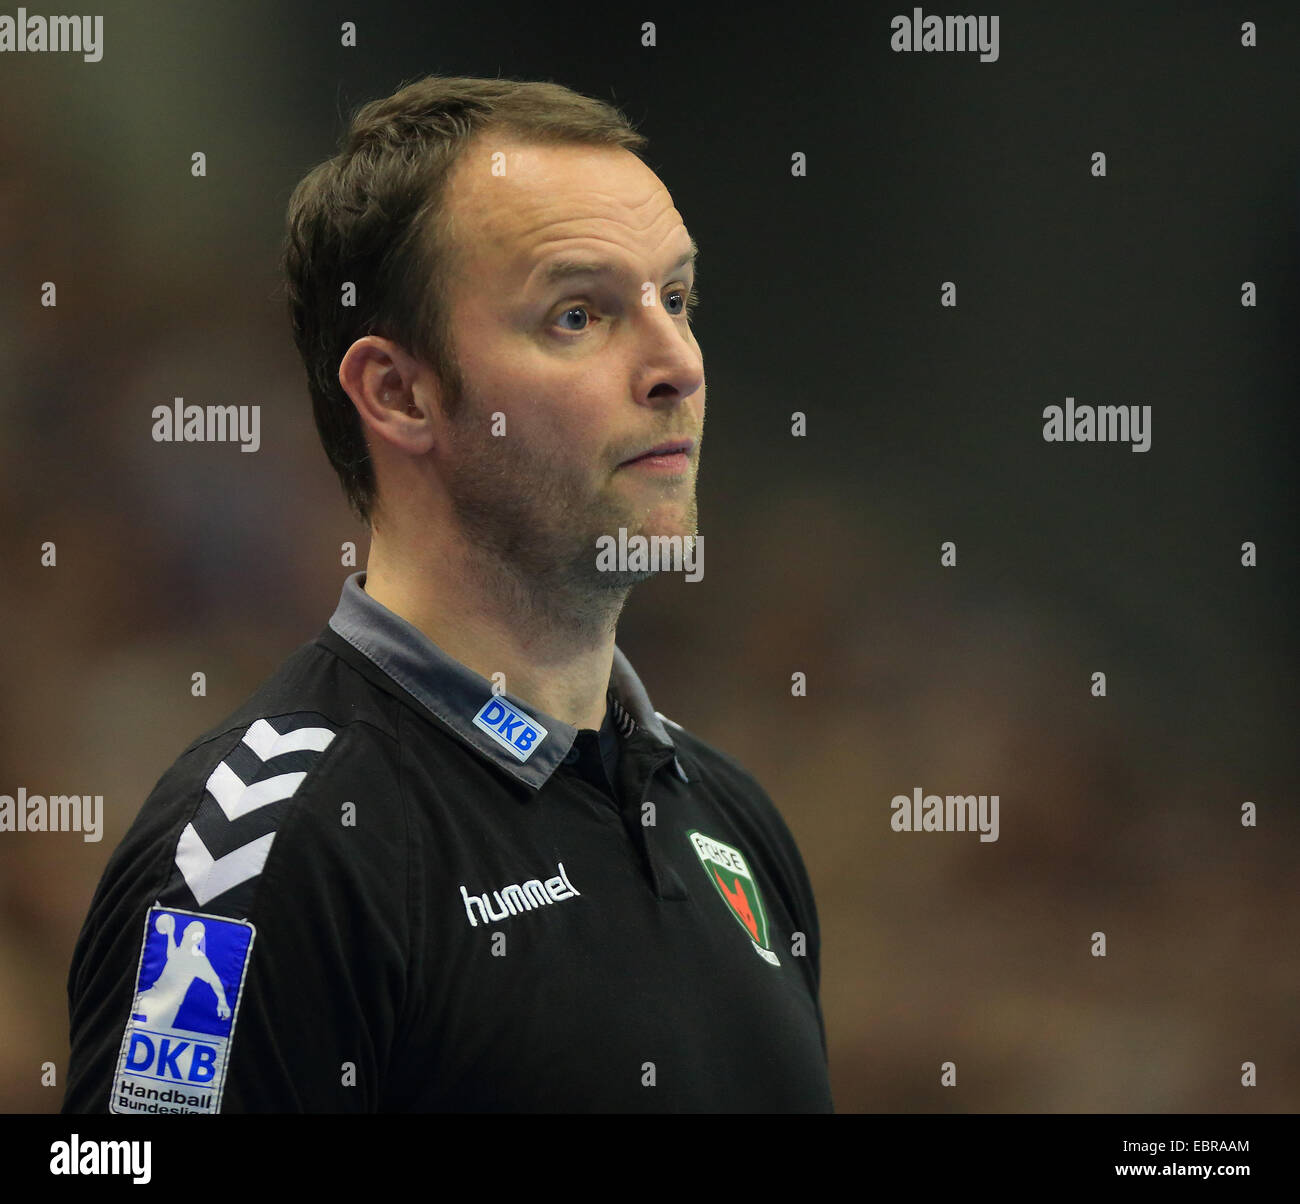 Berlin's Dagur Sigurdsson at the German Bundesliga handball match between FCMagdeburg and Fuechse Berlin - Stock Image